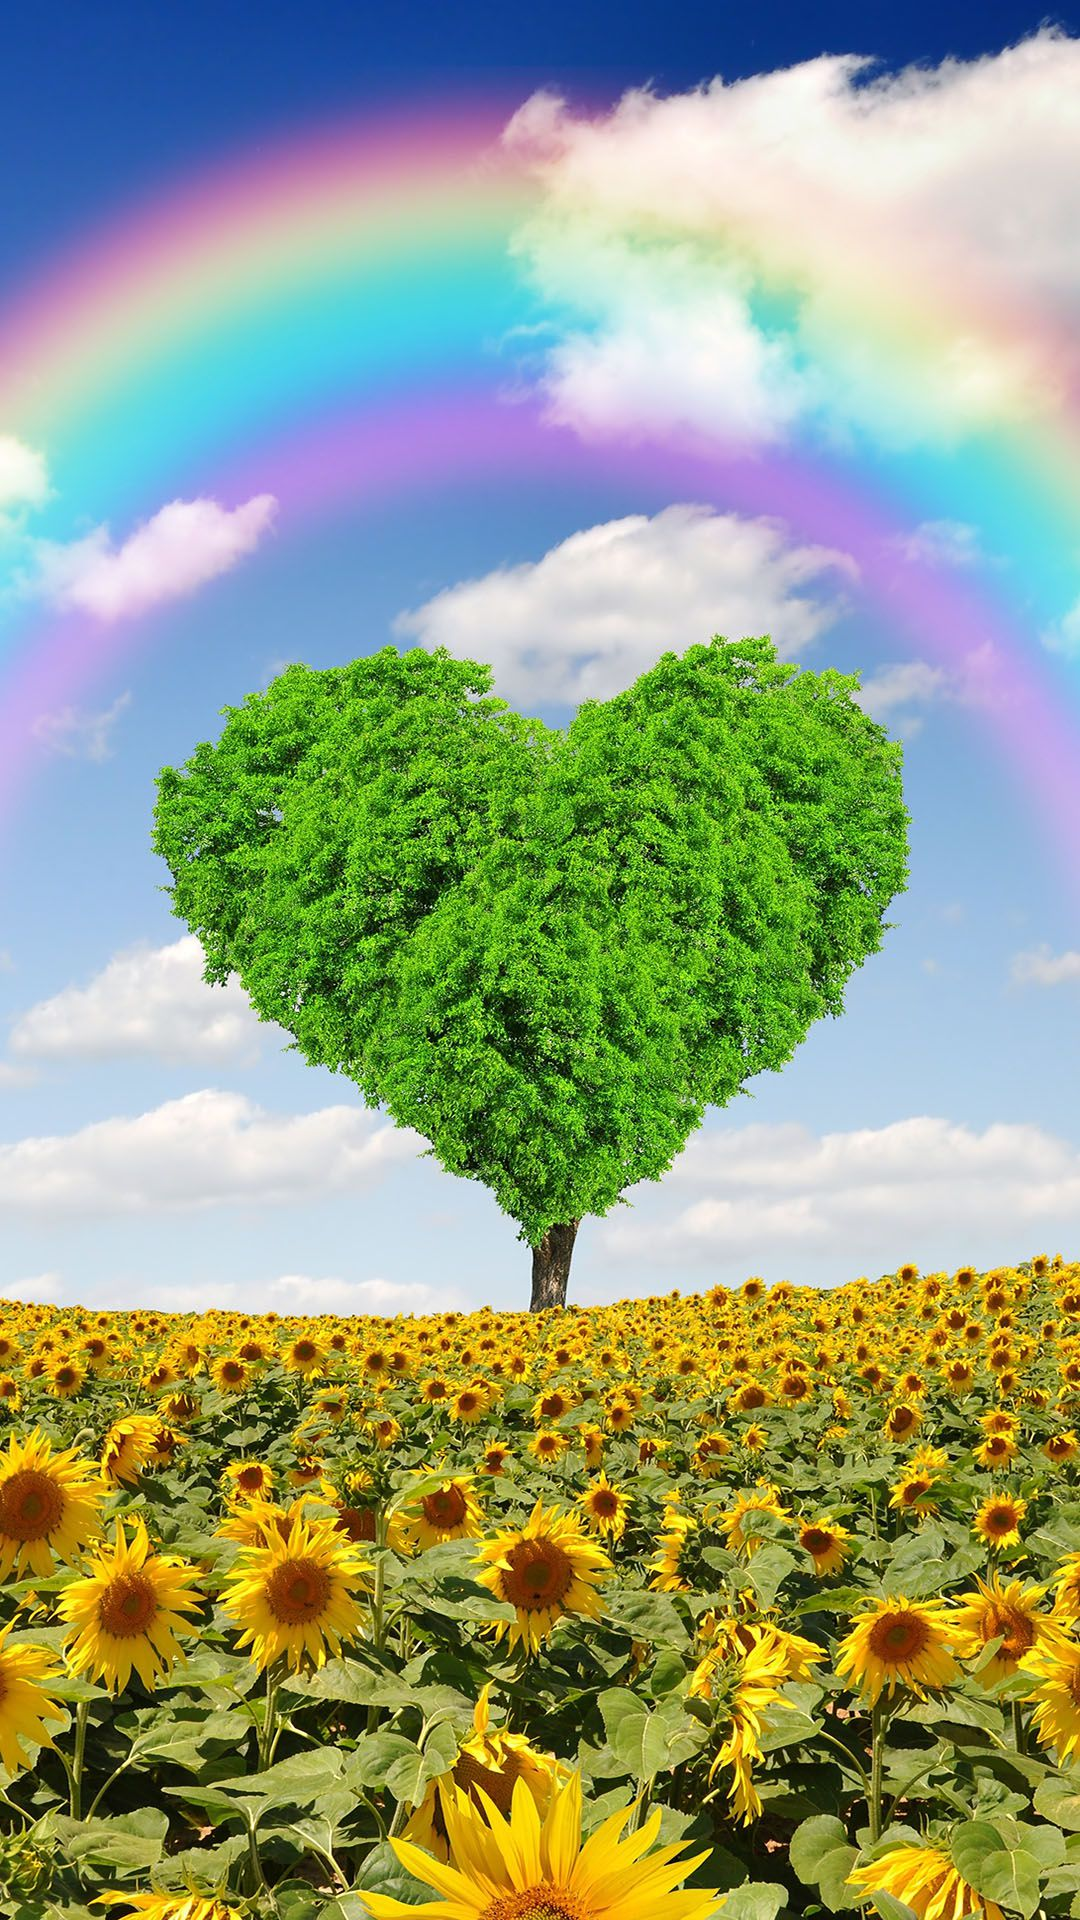 heart tree rainbow clouds sunflower